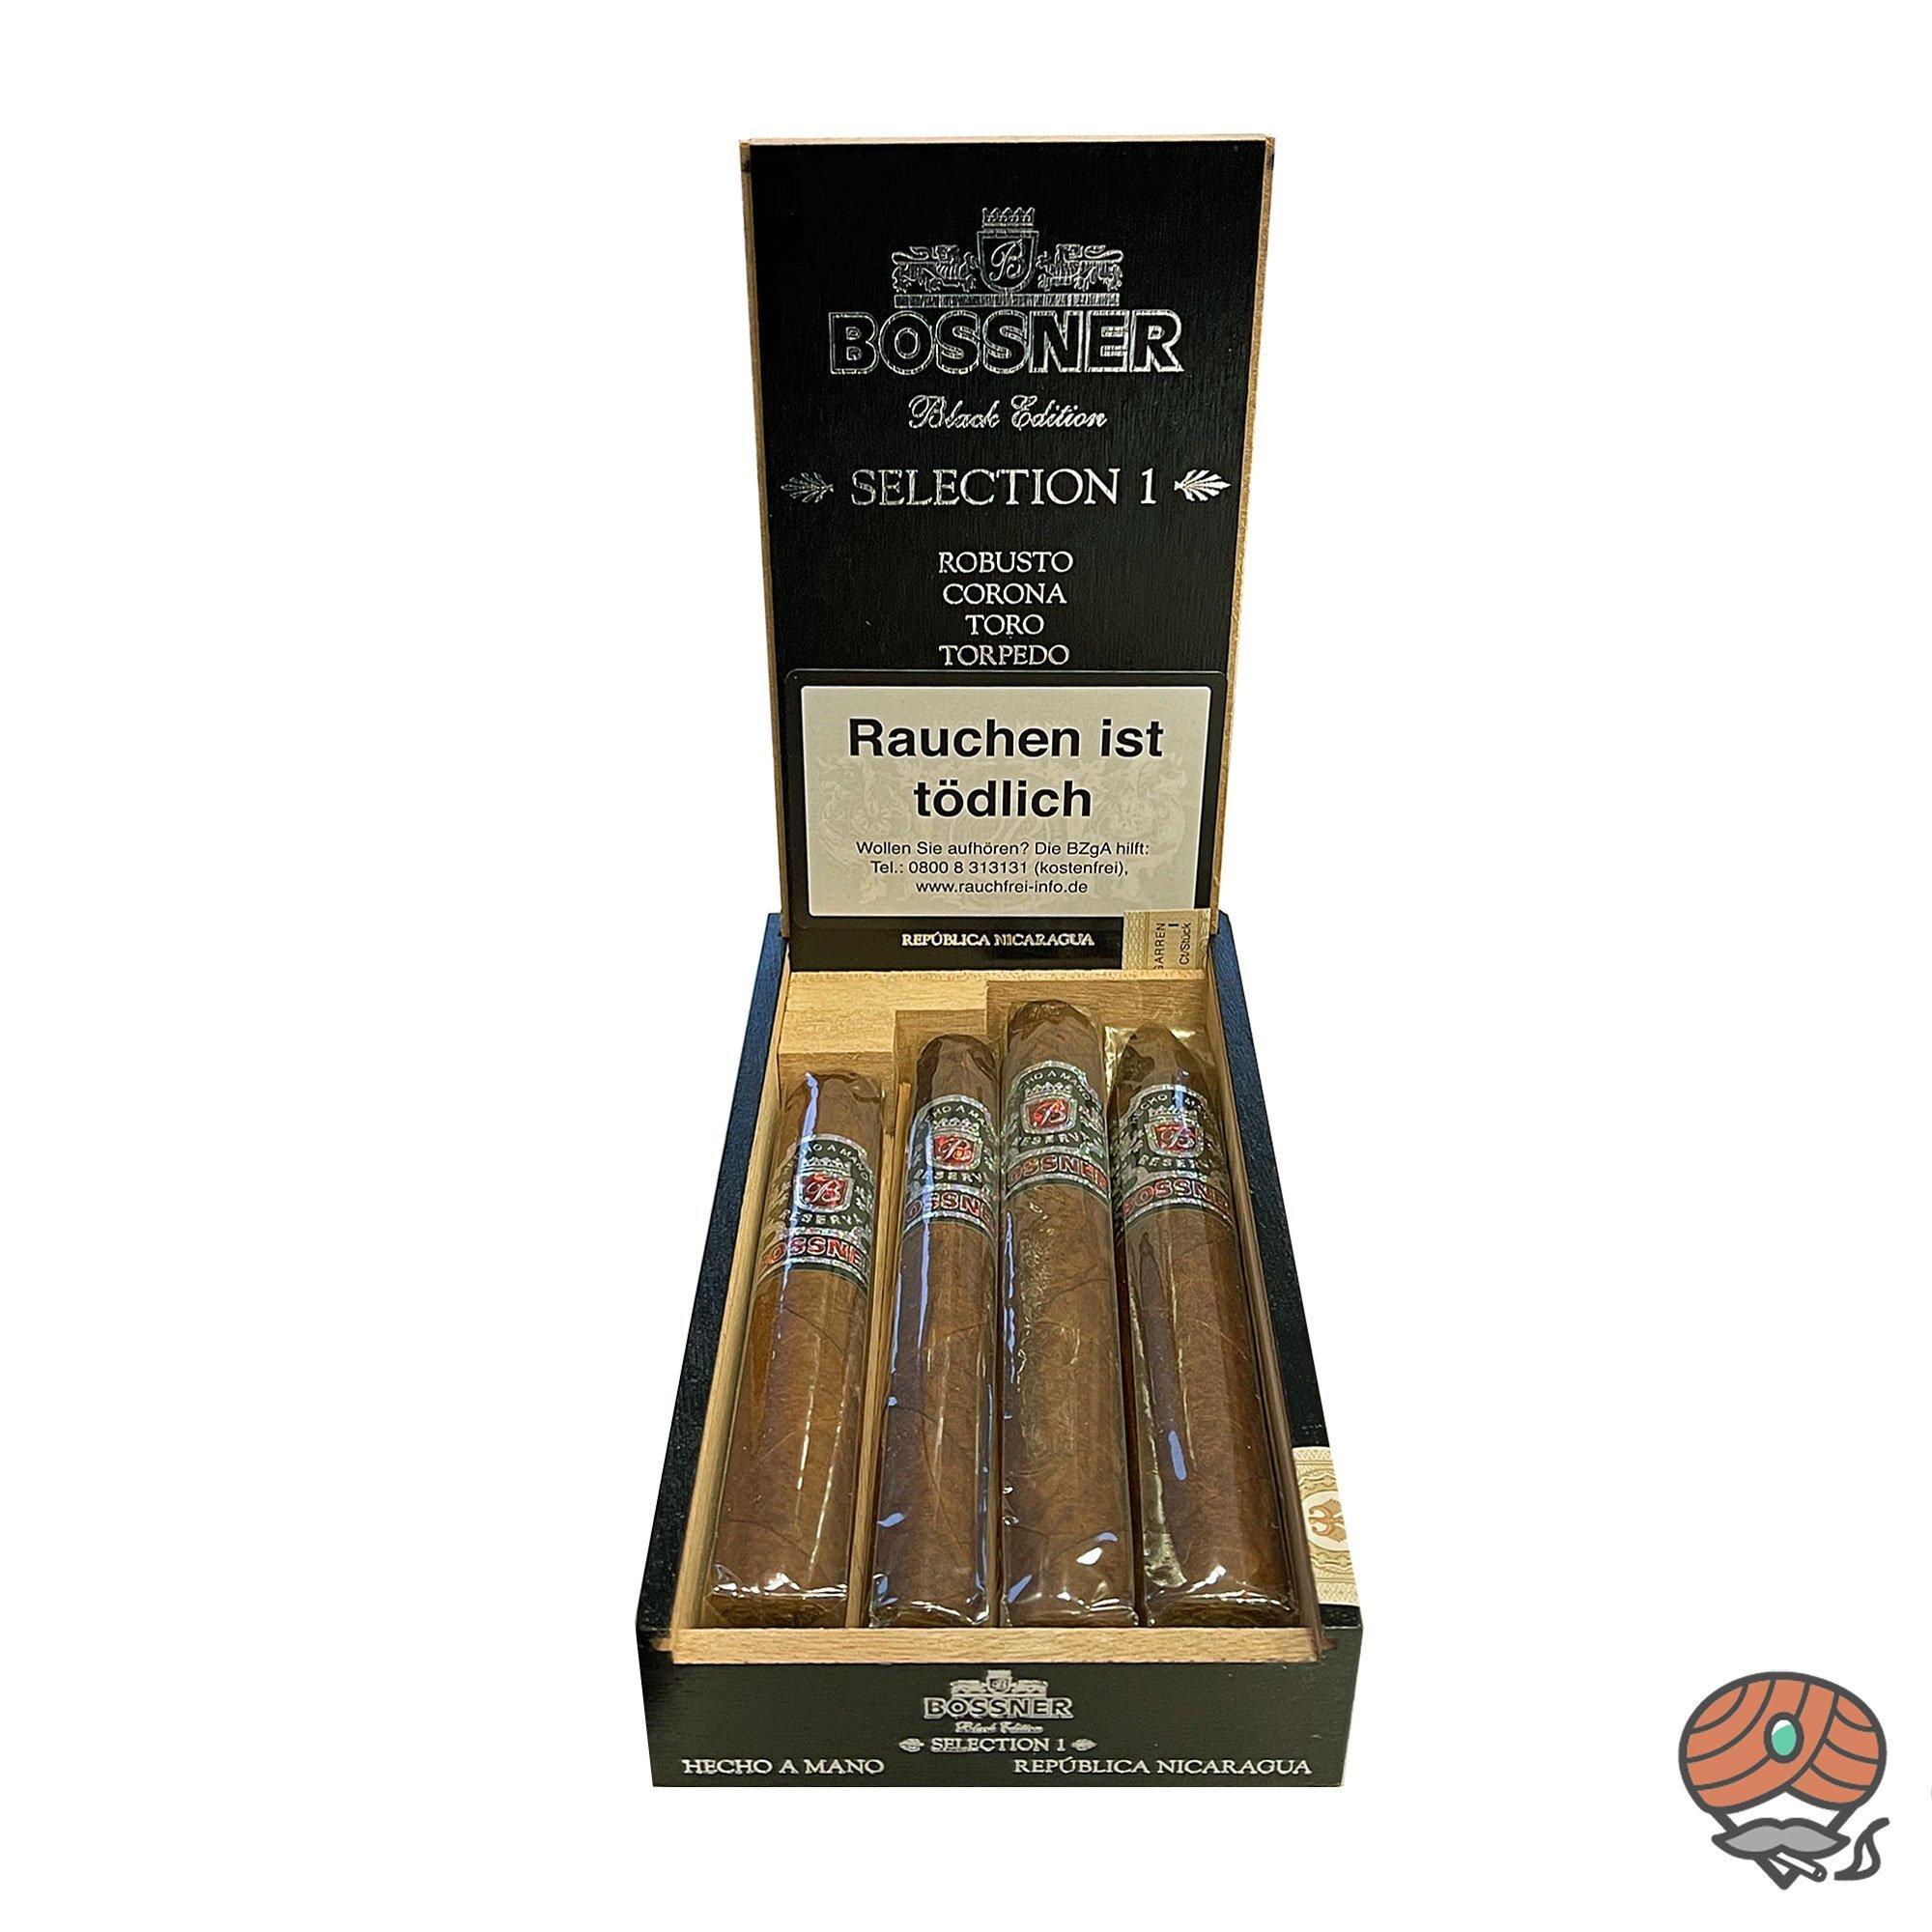 Bossner Black Edition Selection 1 Nicaragua Zigarren 4er Sampler